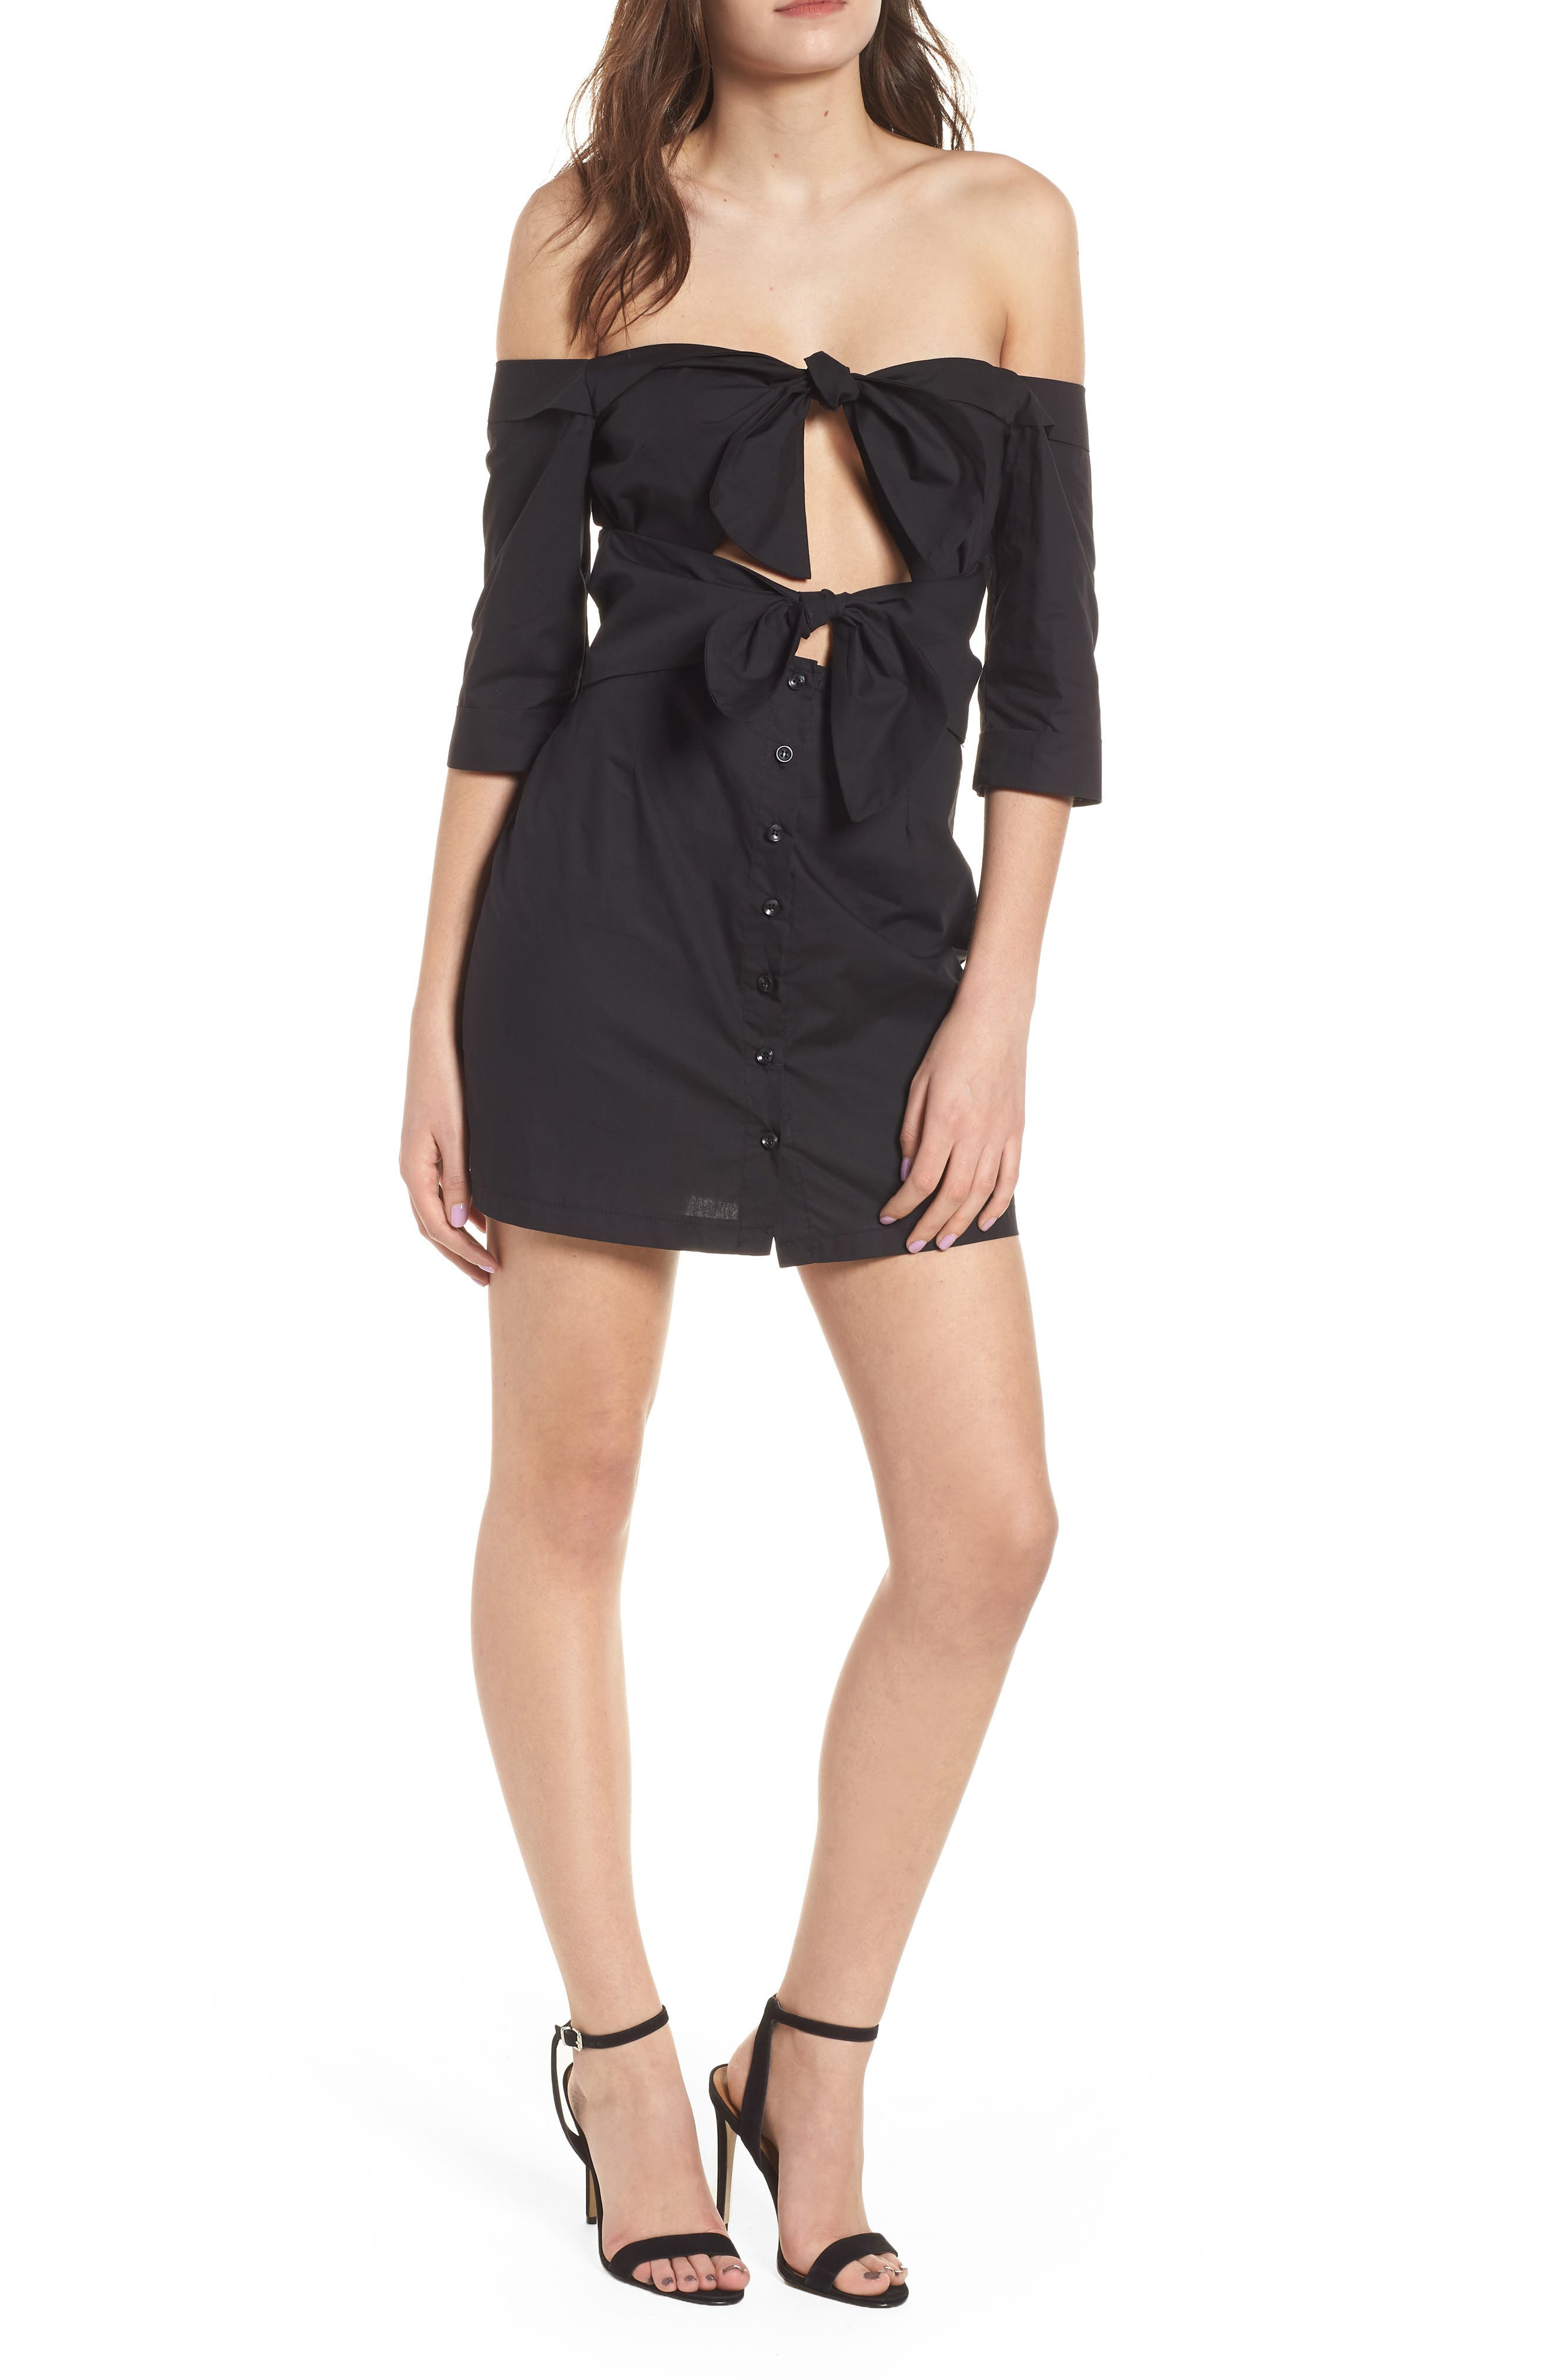 Ultimate Desire Off the Shoulder Minidress,                             Main thumbnail 1, color,                             Black